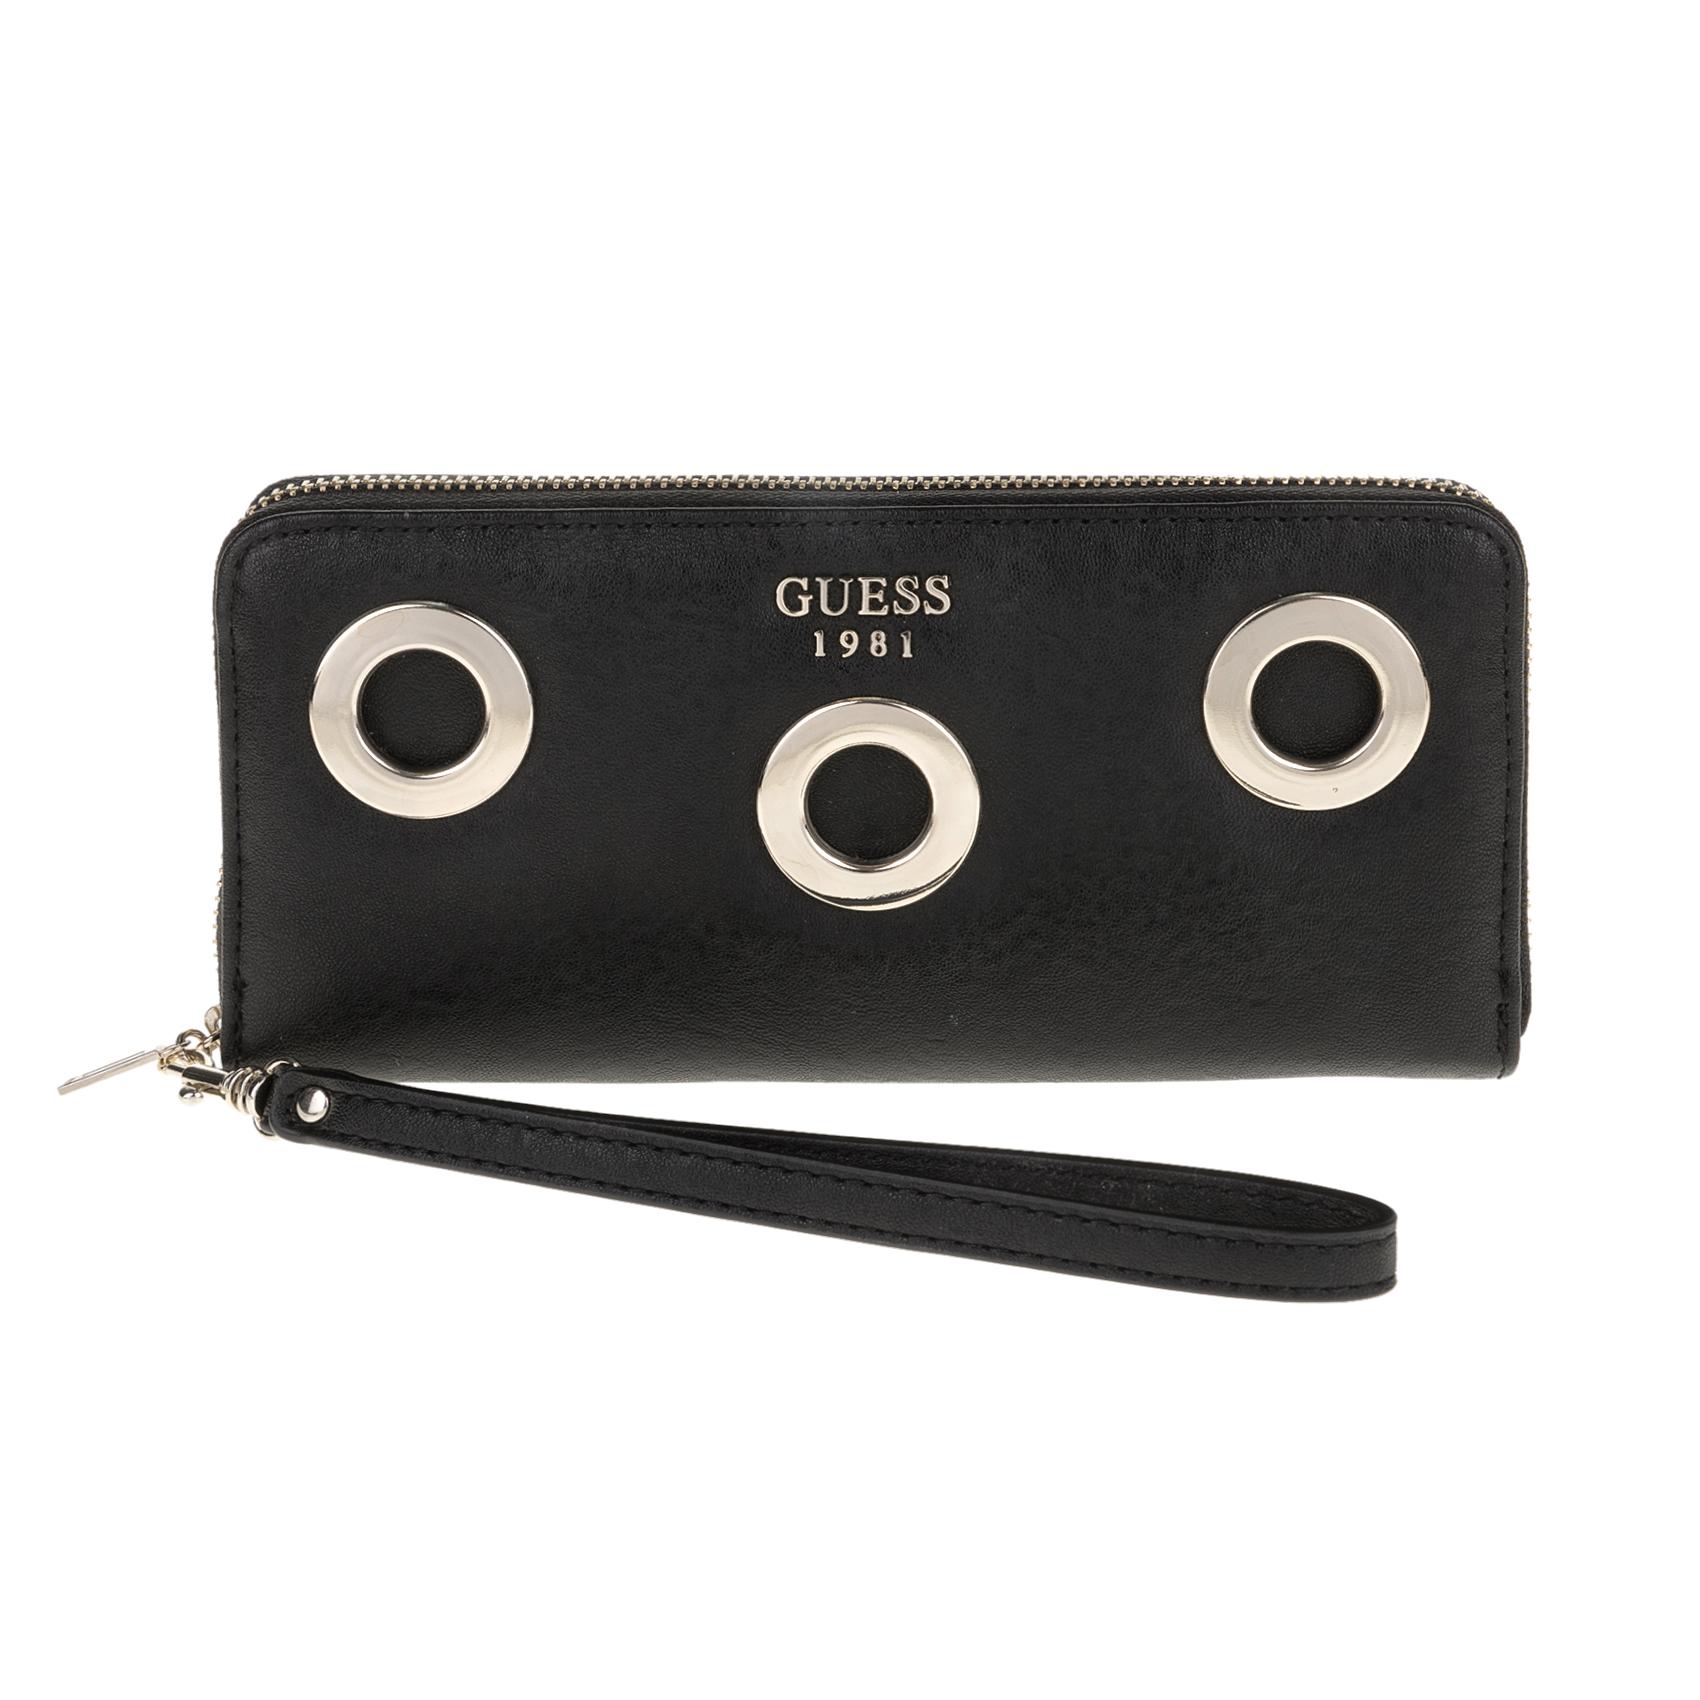 GUESS – Γυναικείο πορτοφόλι GUESS μαύρο